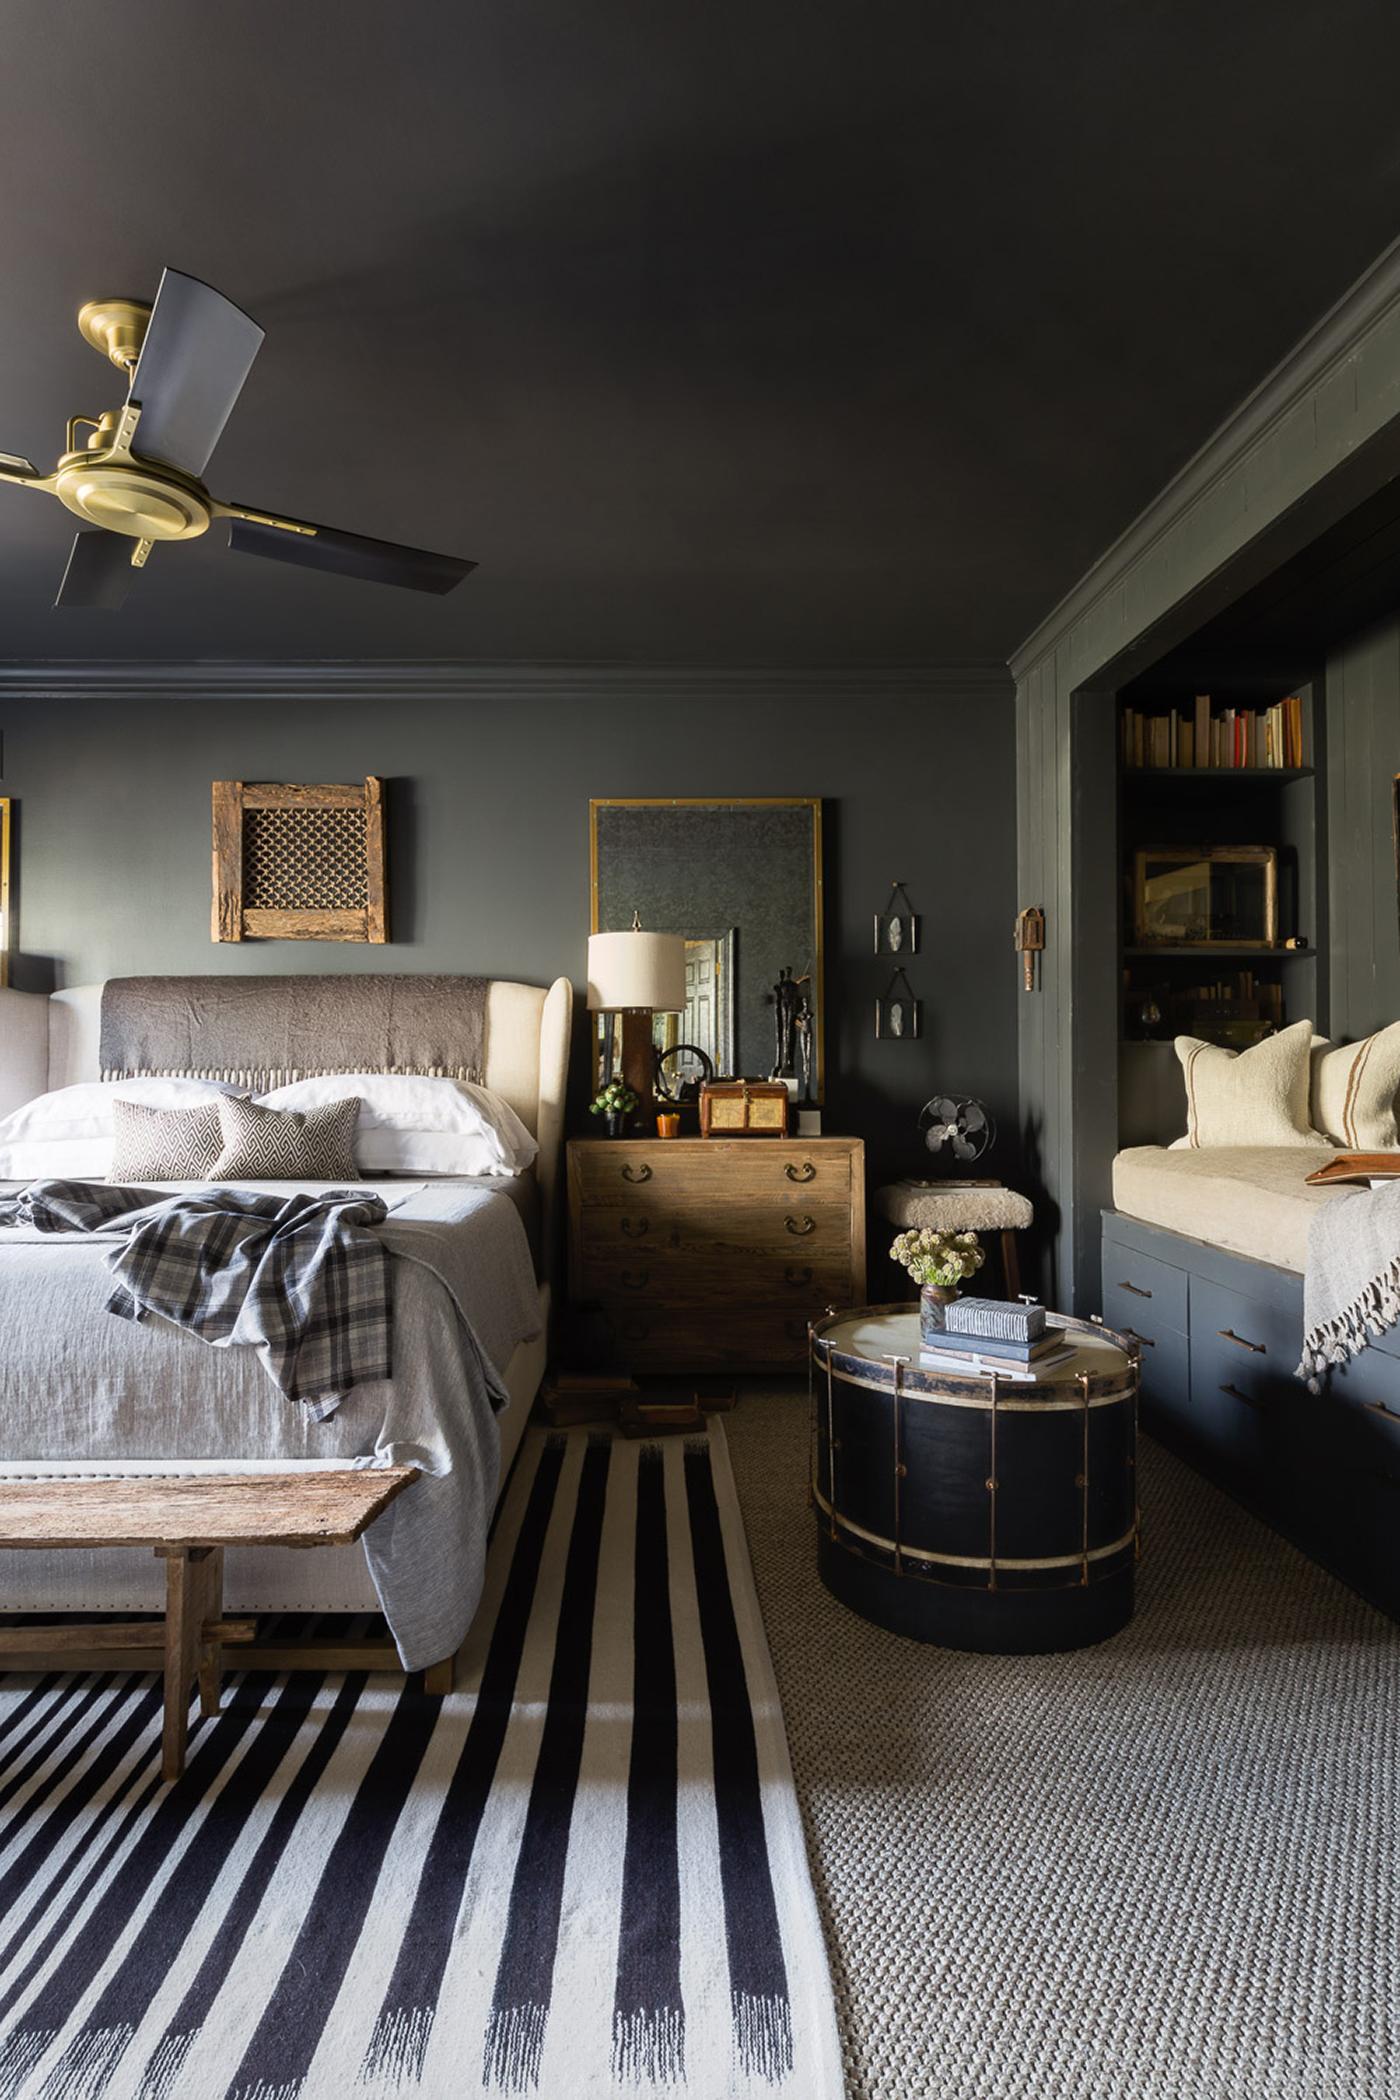 A moody master bedroomby Sean Anderson Design